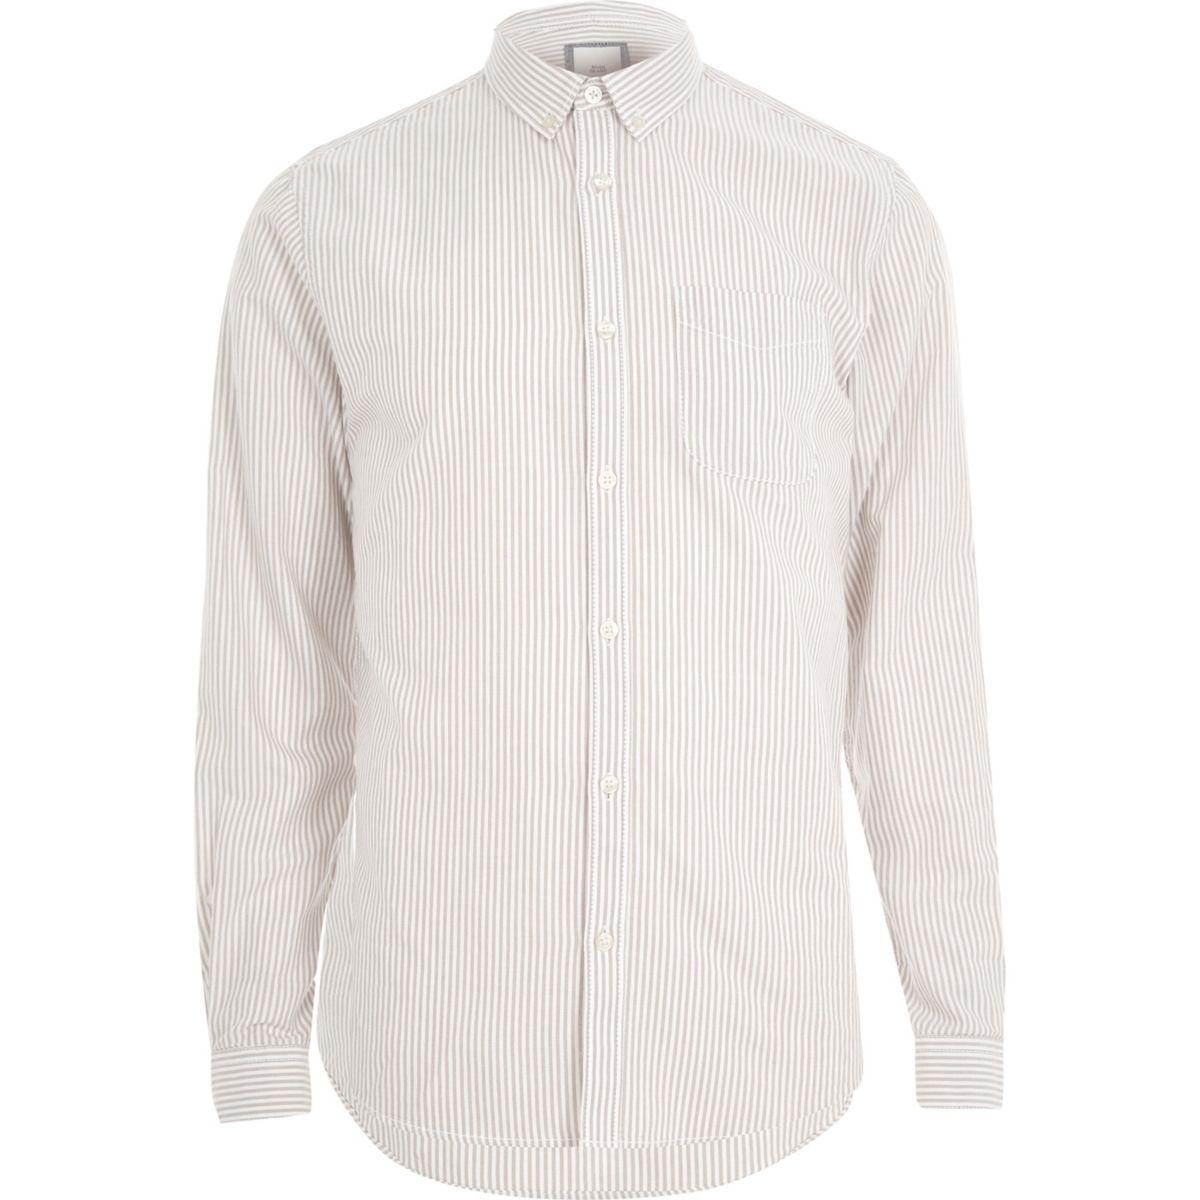 Stone stripe print long sleeve Oxford shirt